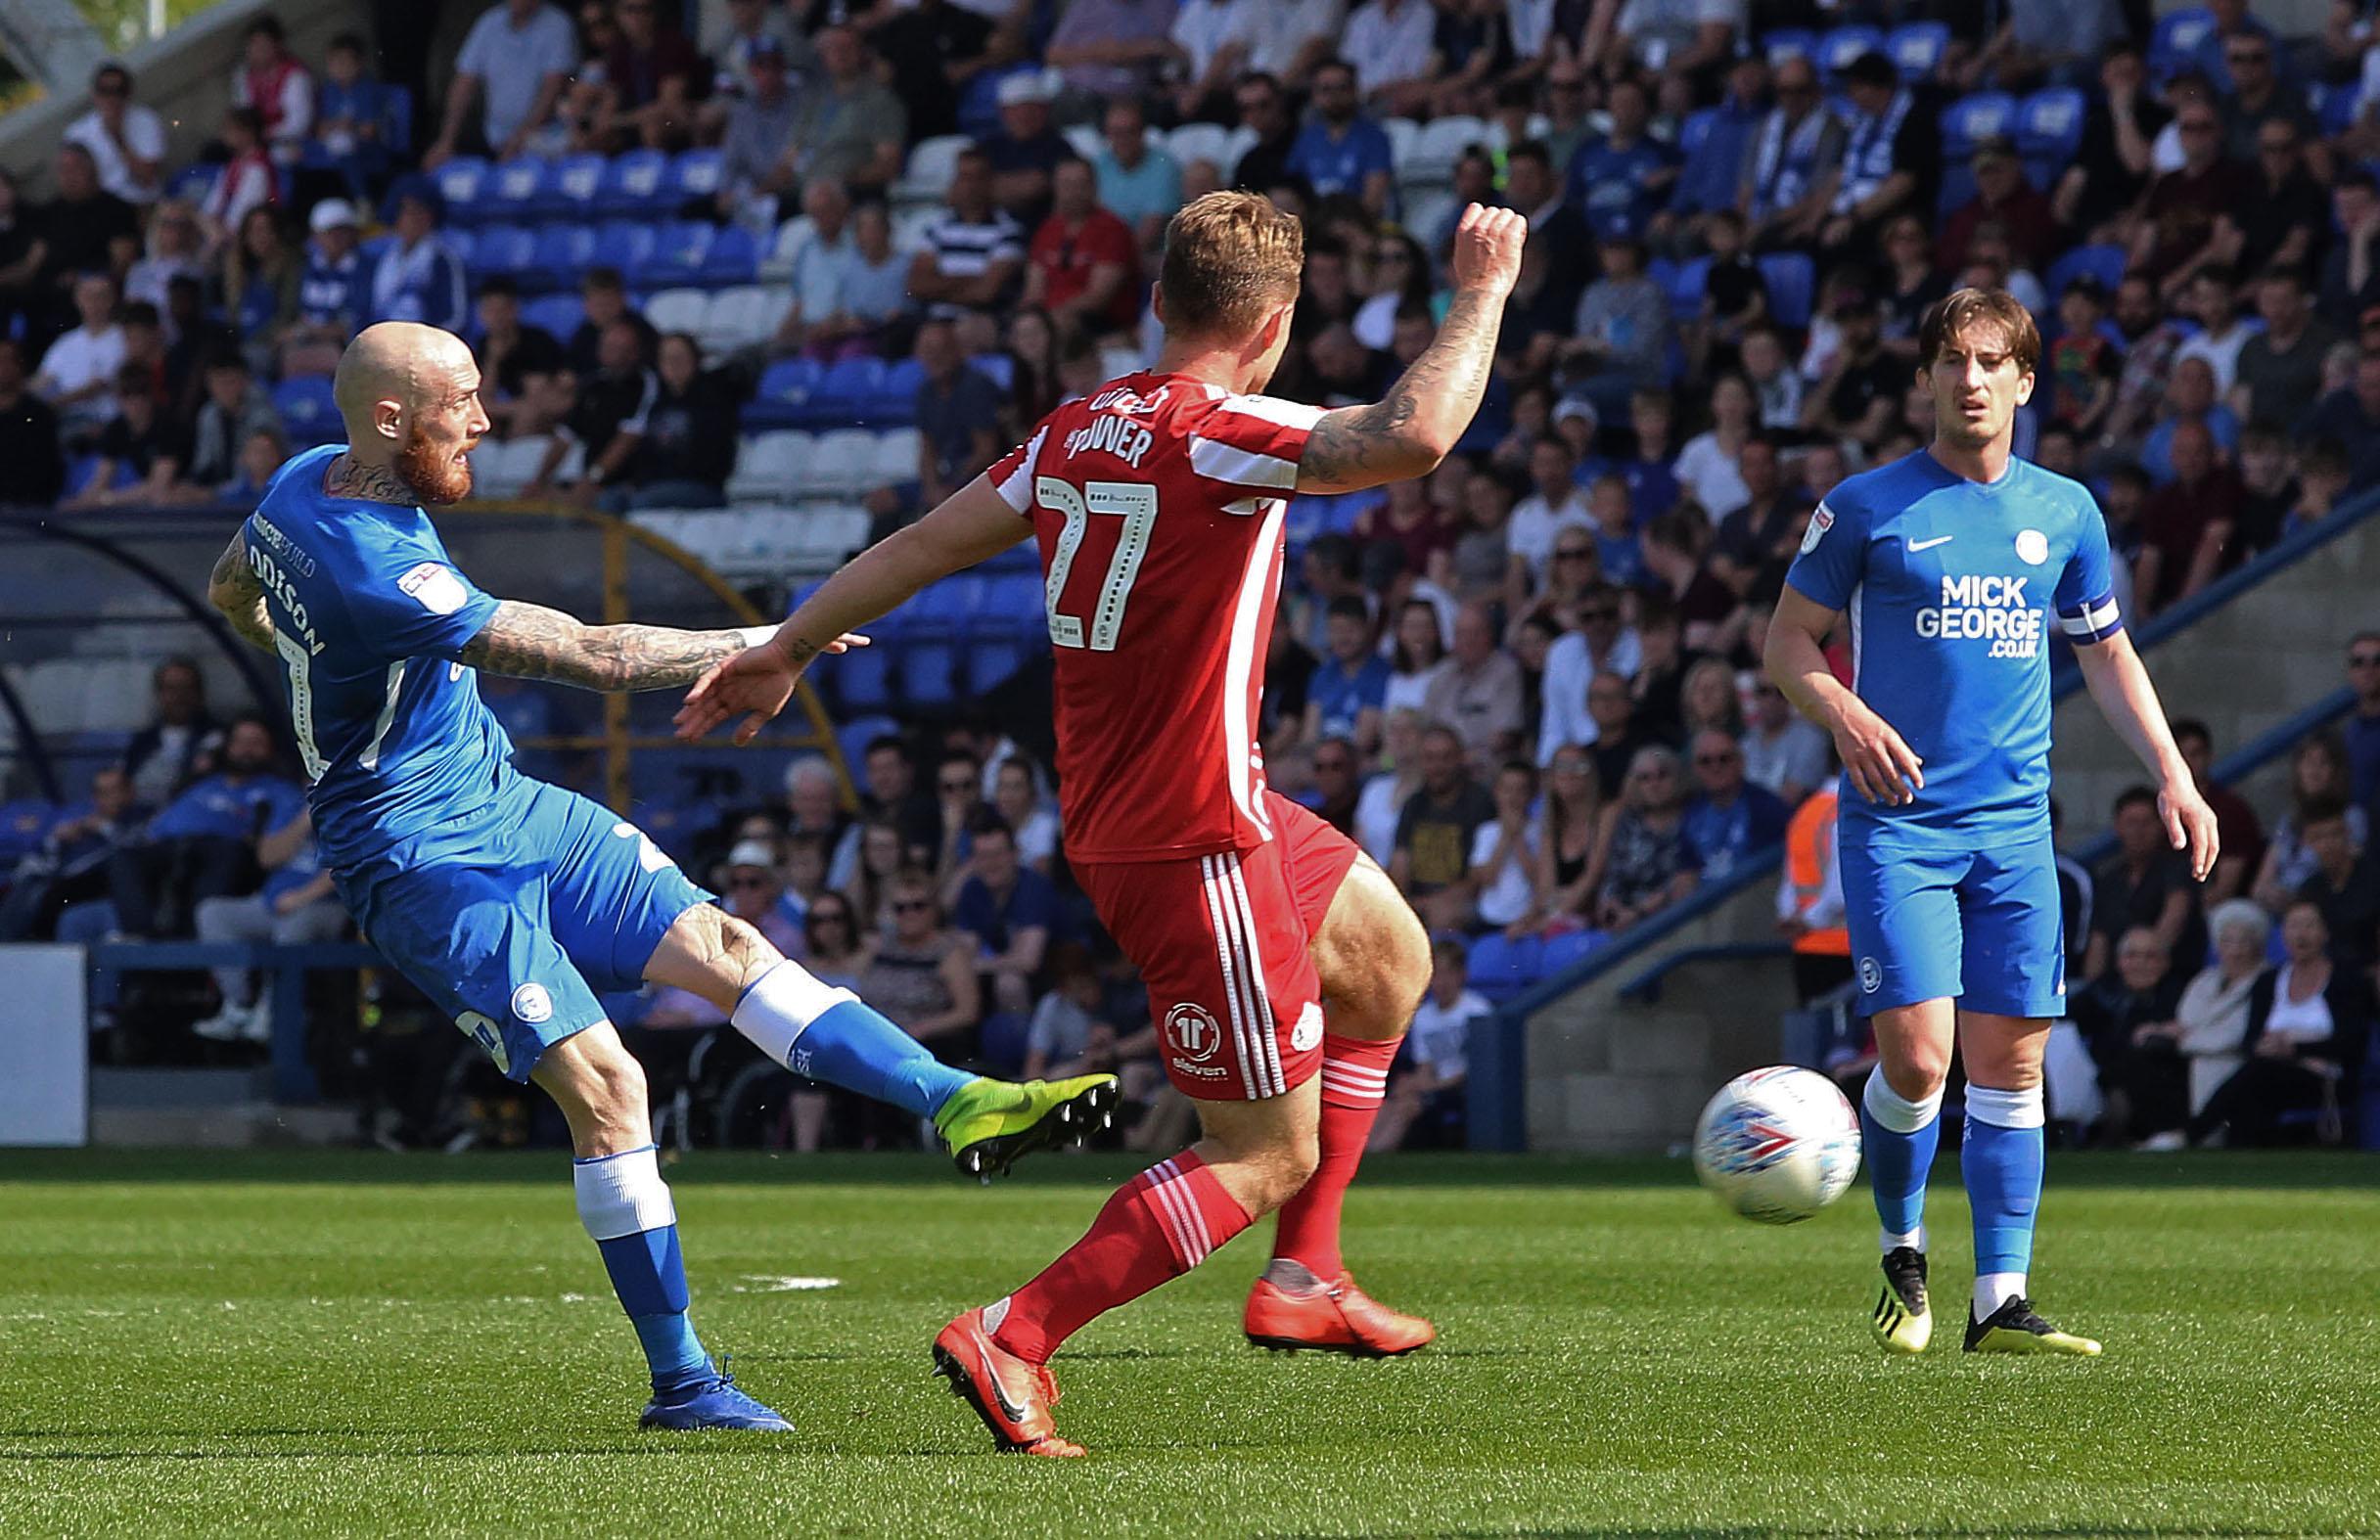 Peterborough United v Sunderland - Sky Bet League One